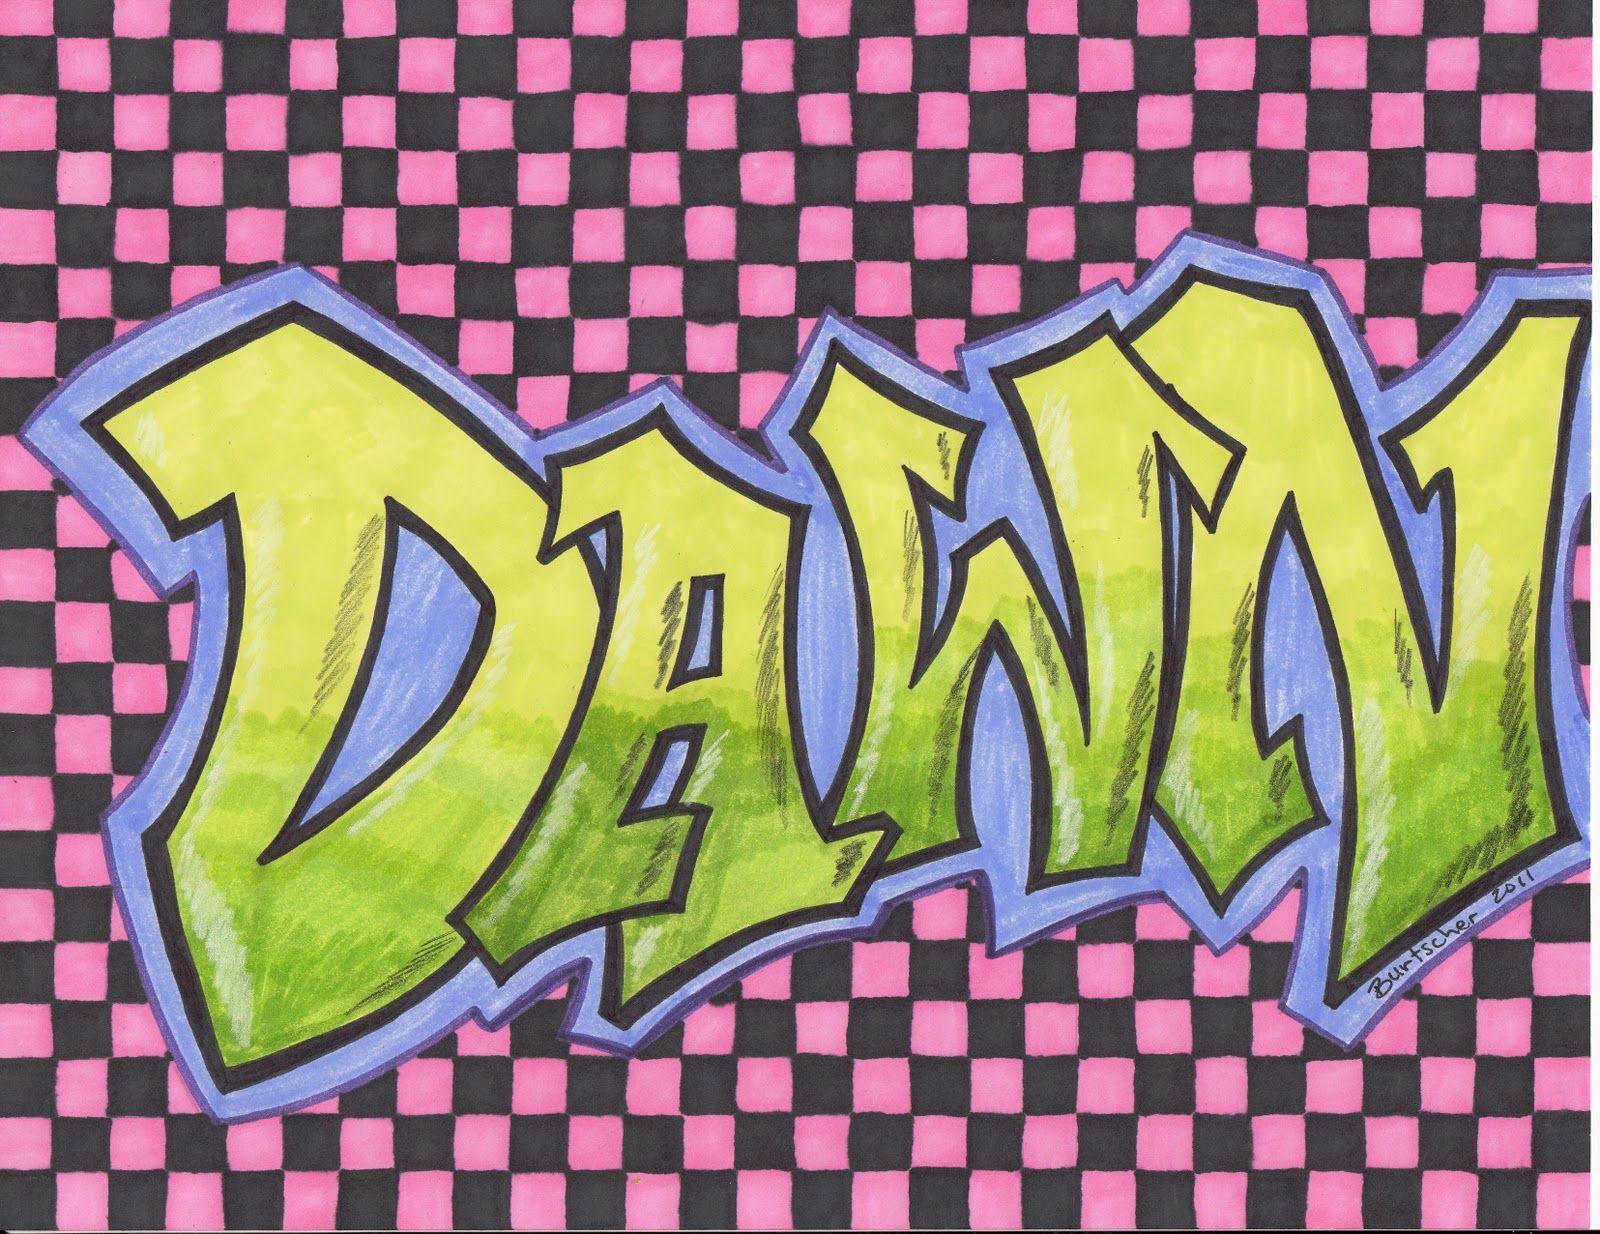 Graffiti creator how to save - Graffiti Creator How To Save 37